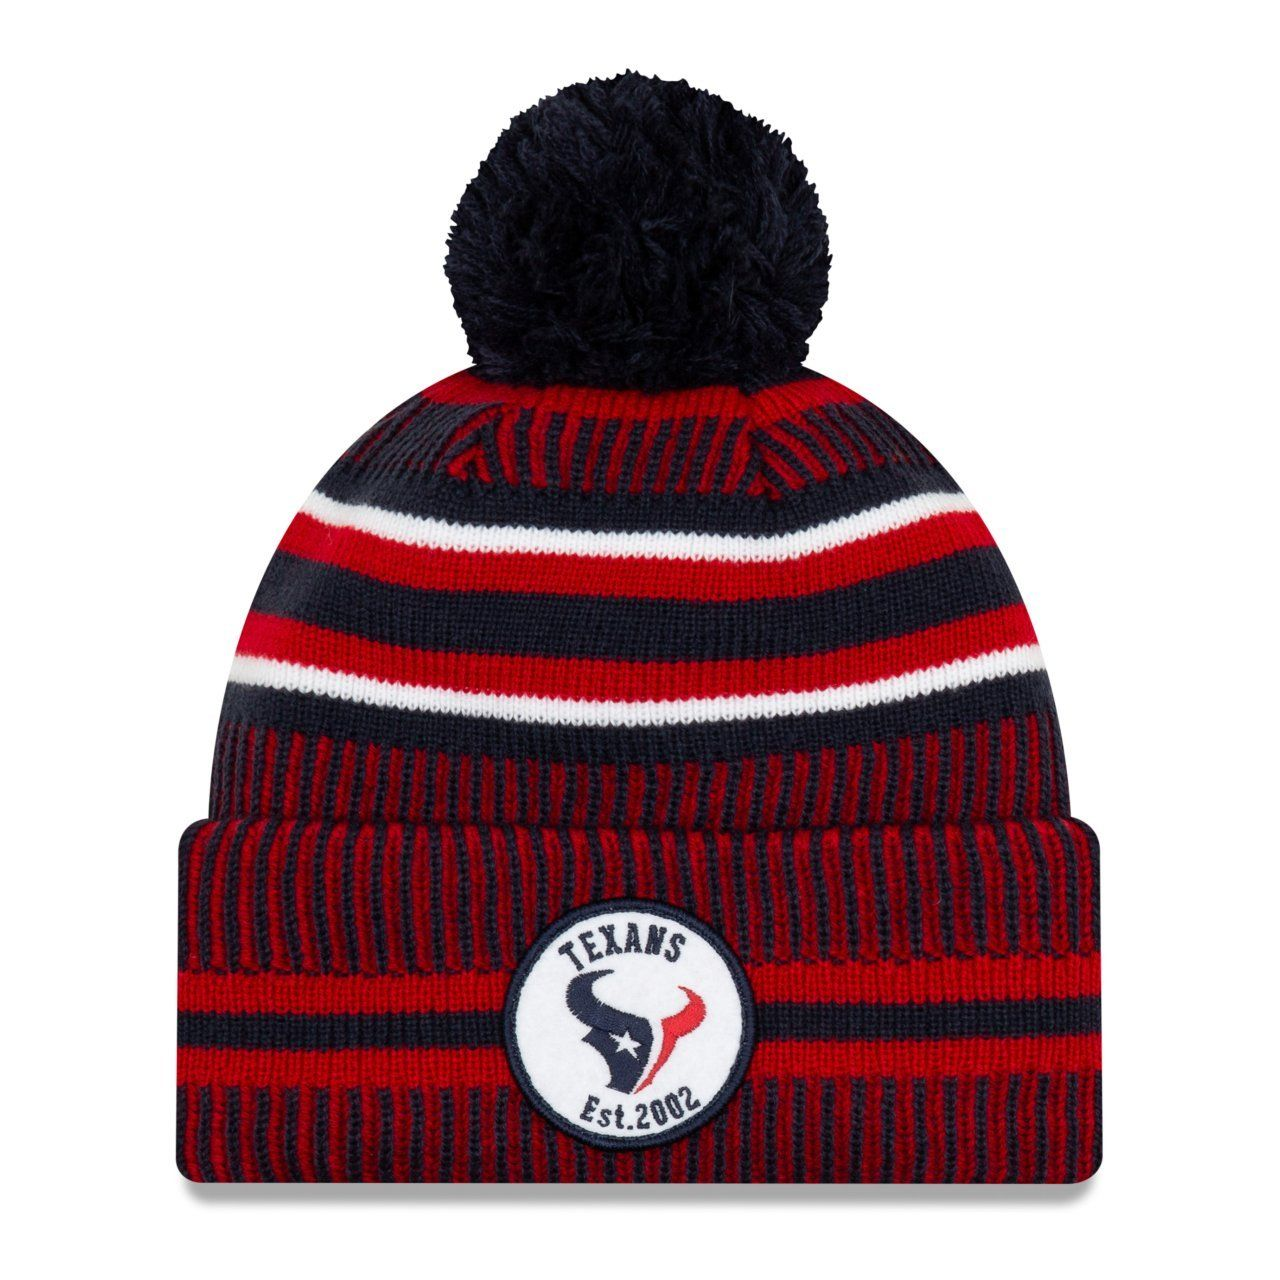 amfoo - New Era Sideline Bommel Kinder Youth Mütze Houston Texans